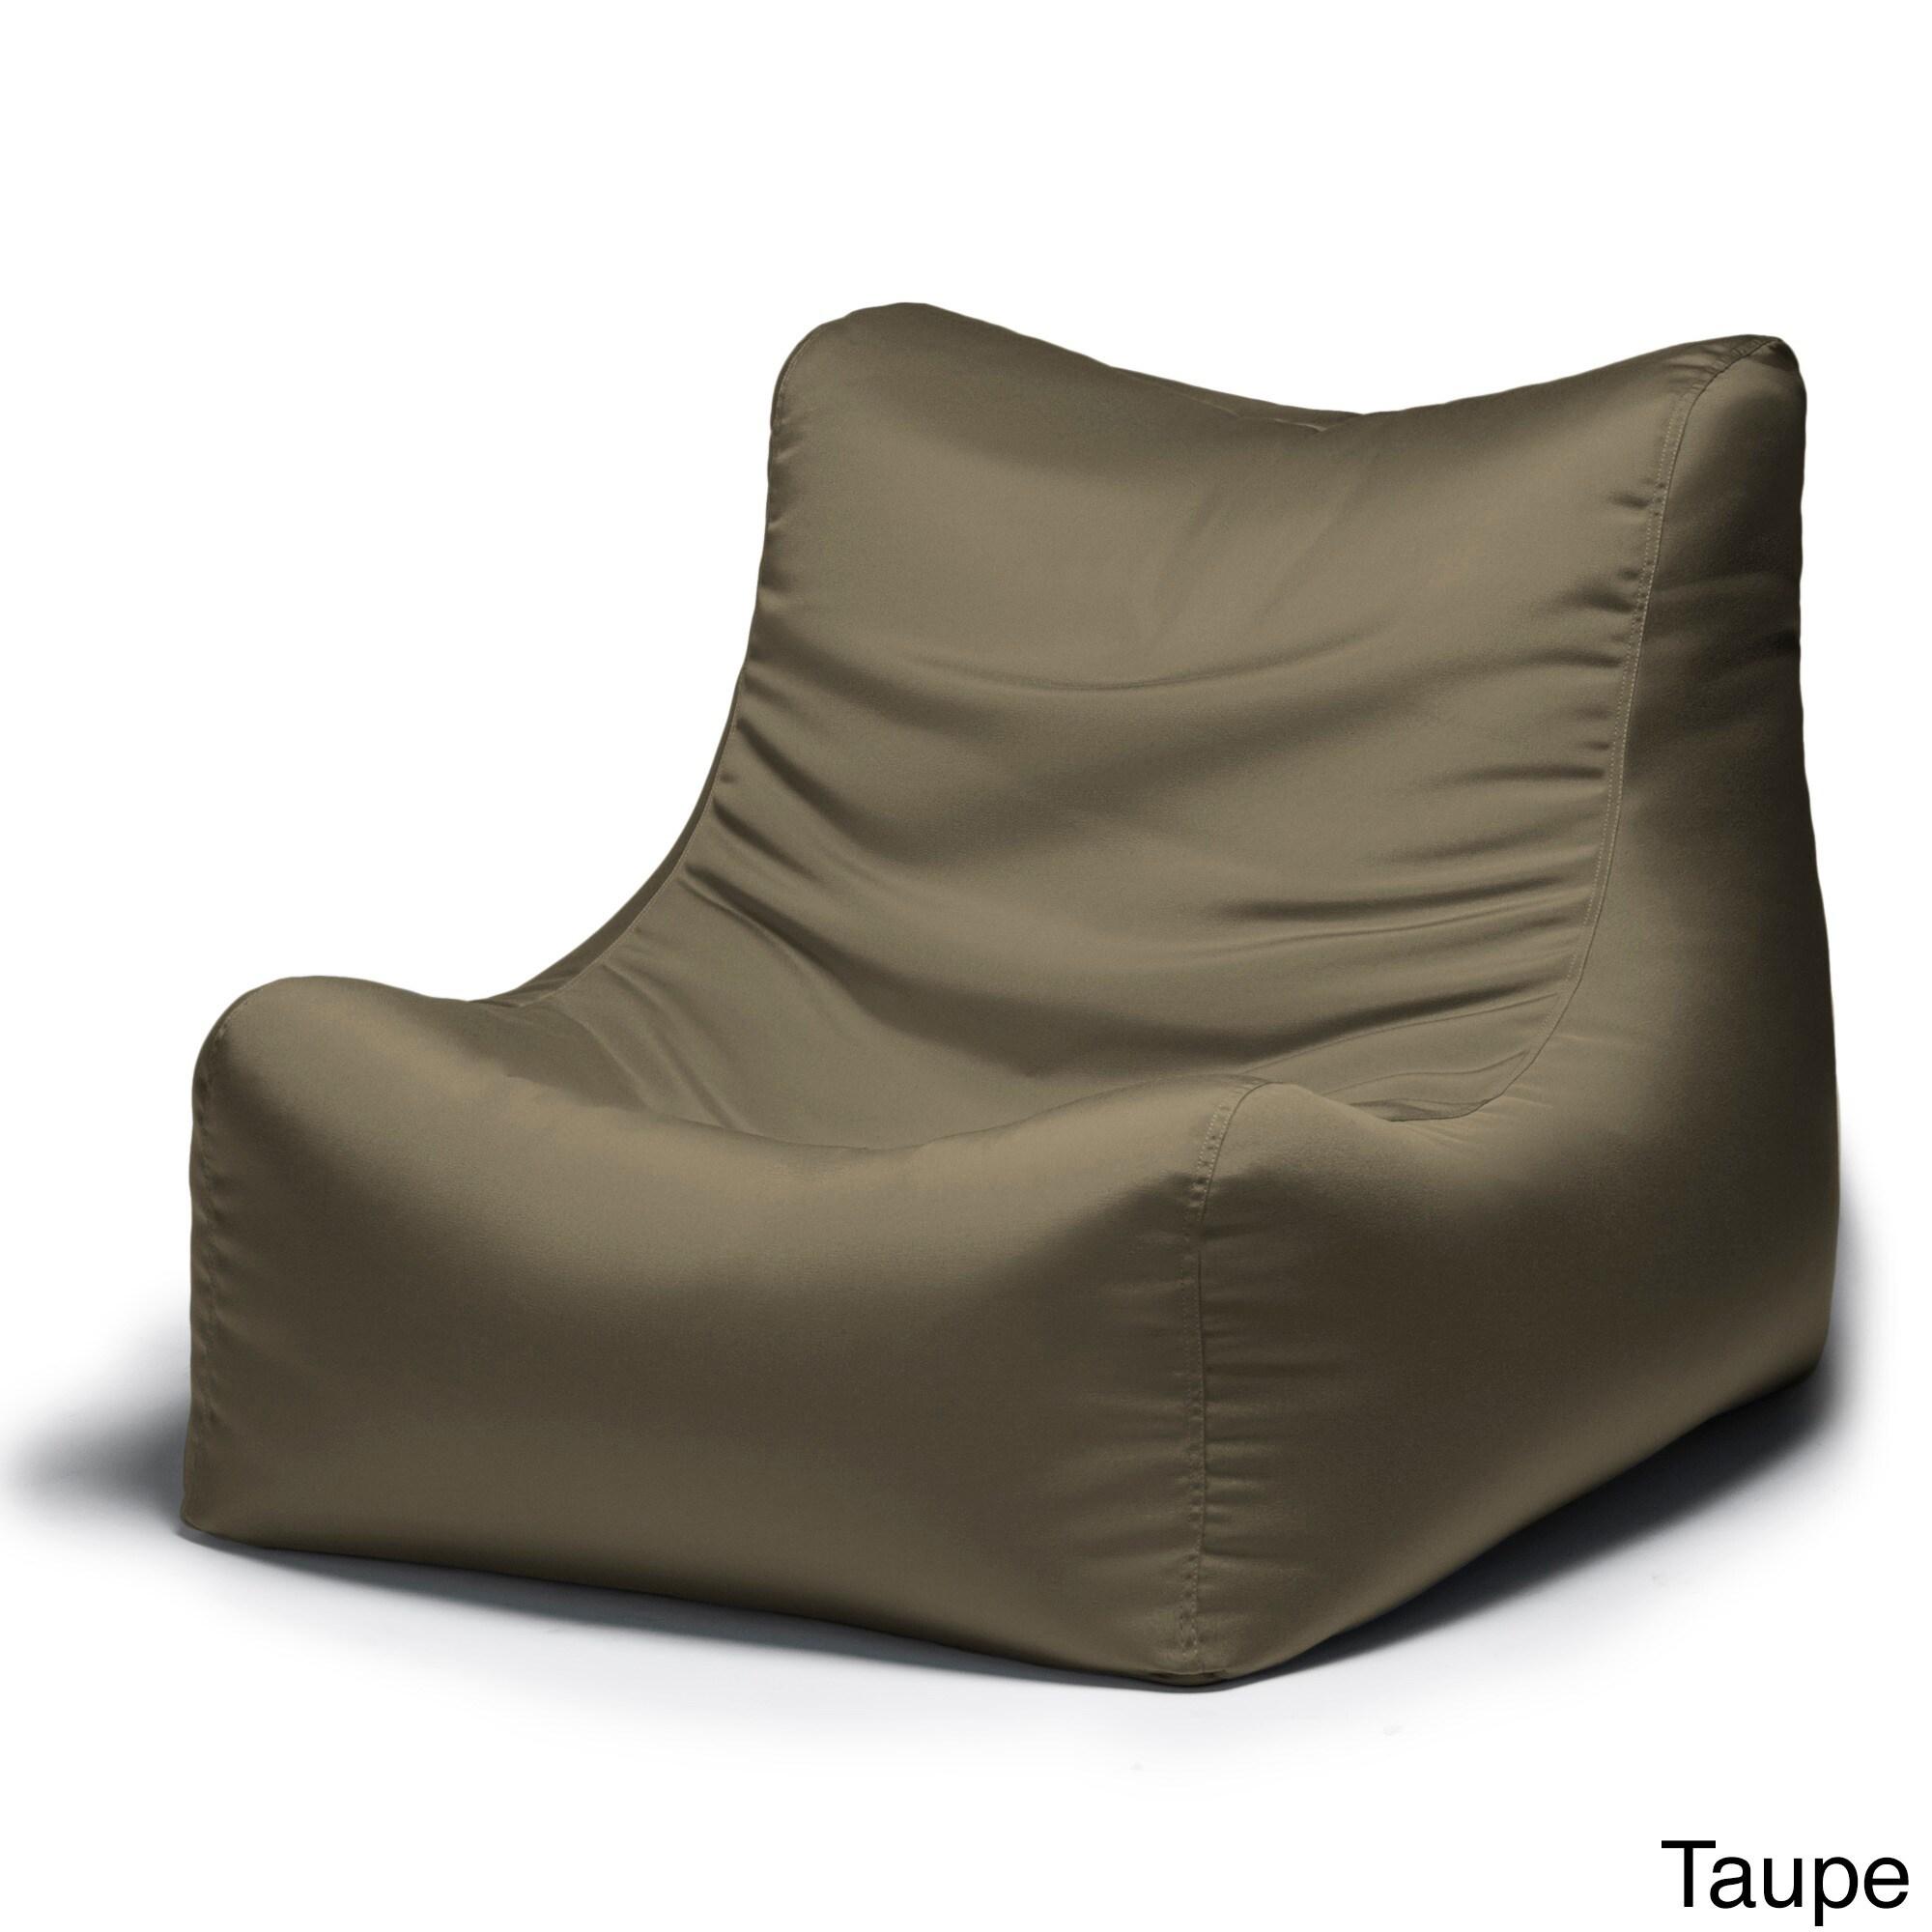 Delightful Jaxx Ponce Outdoor Bean Bag Patio Chair